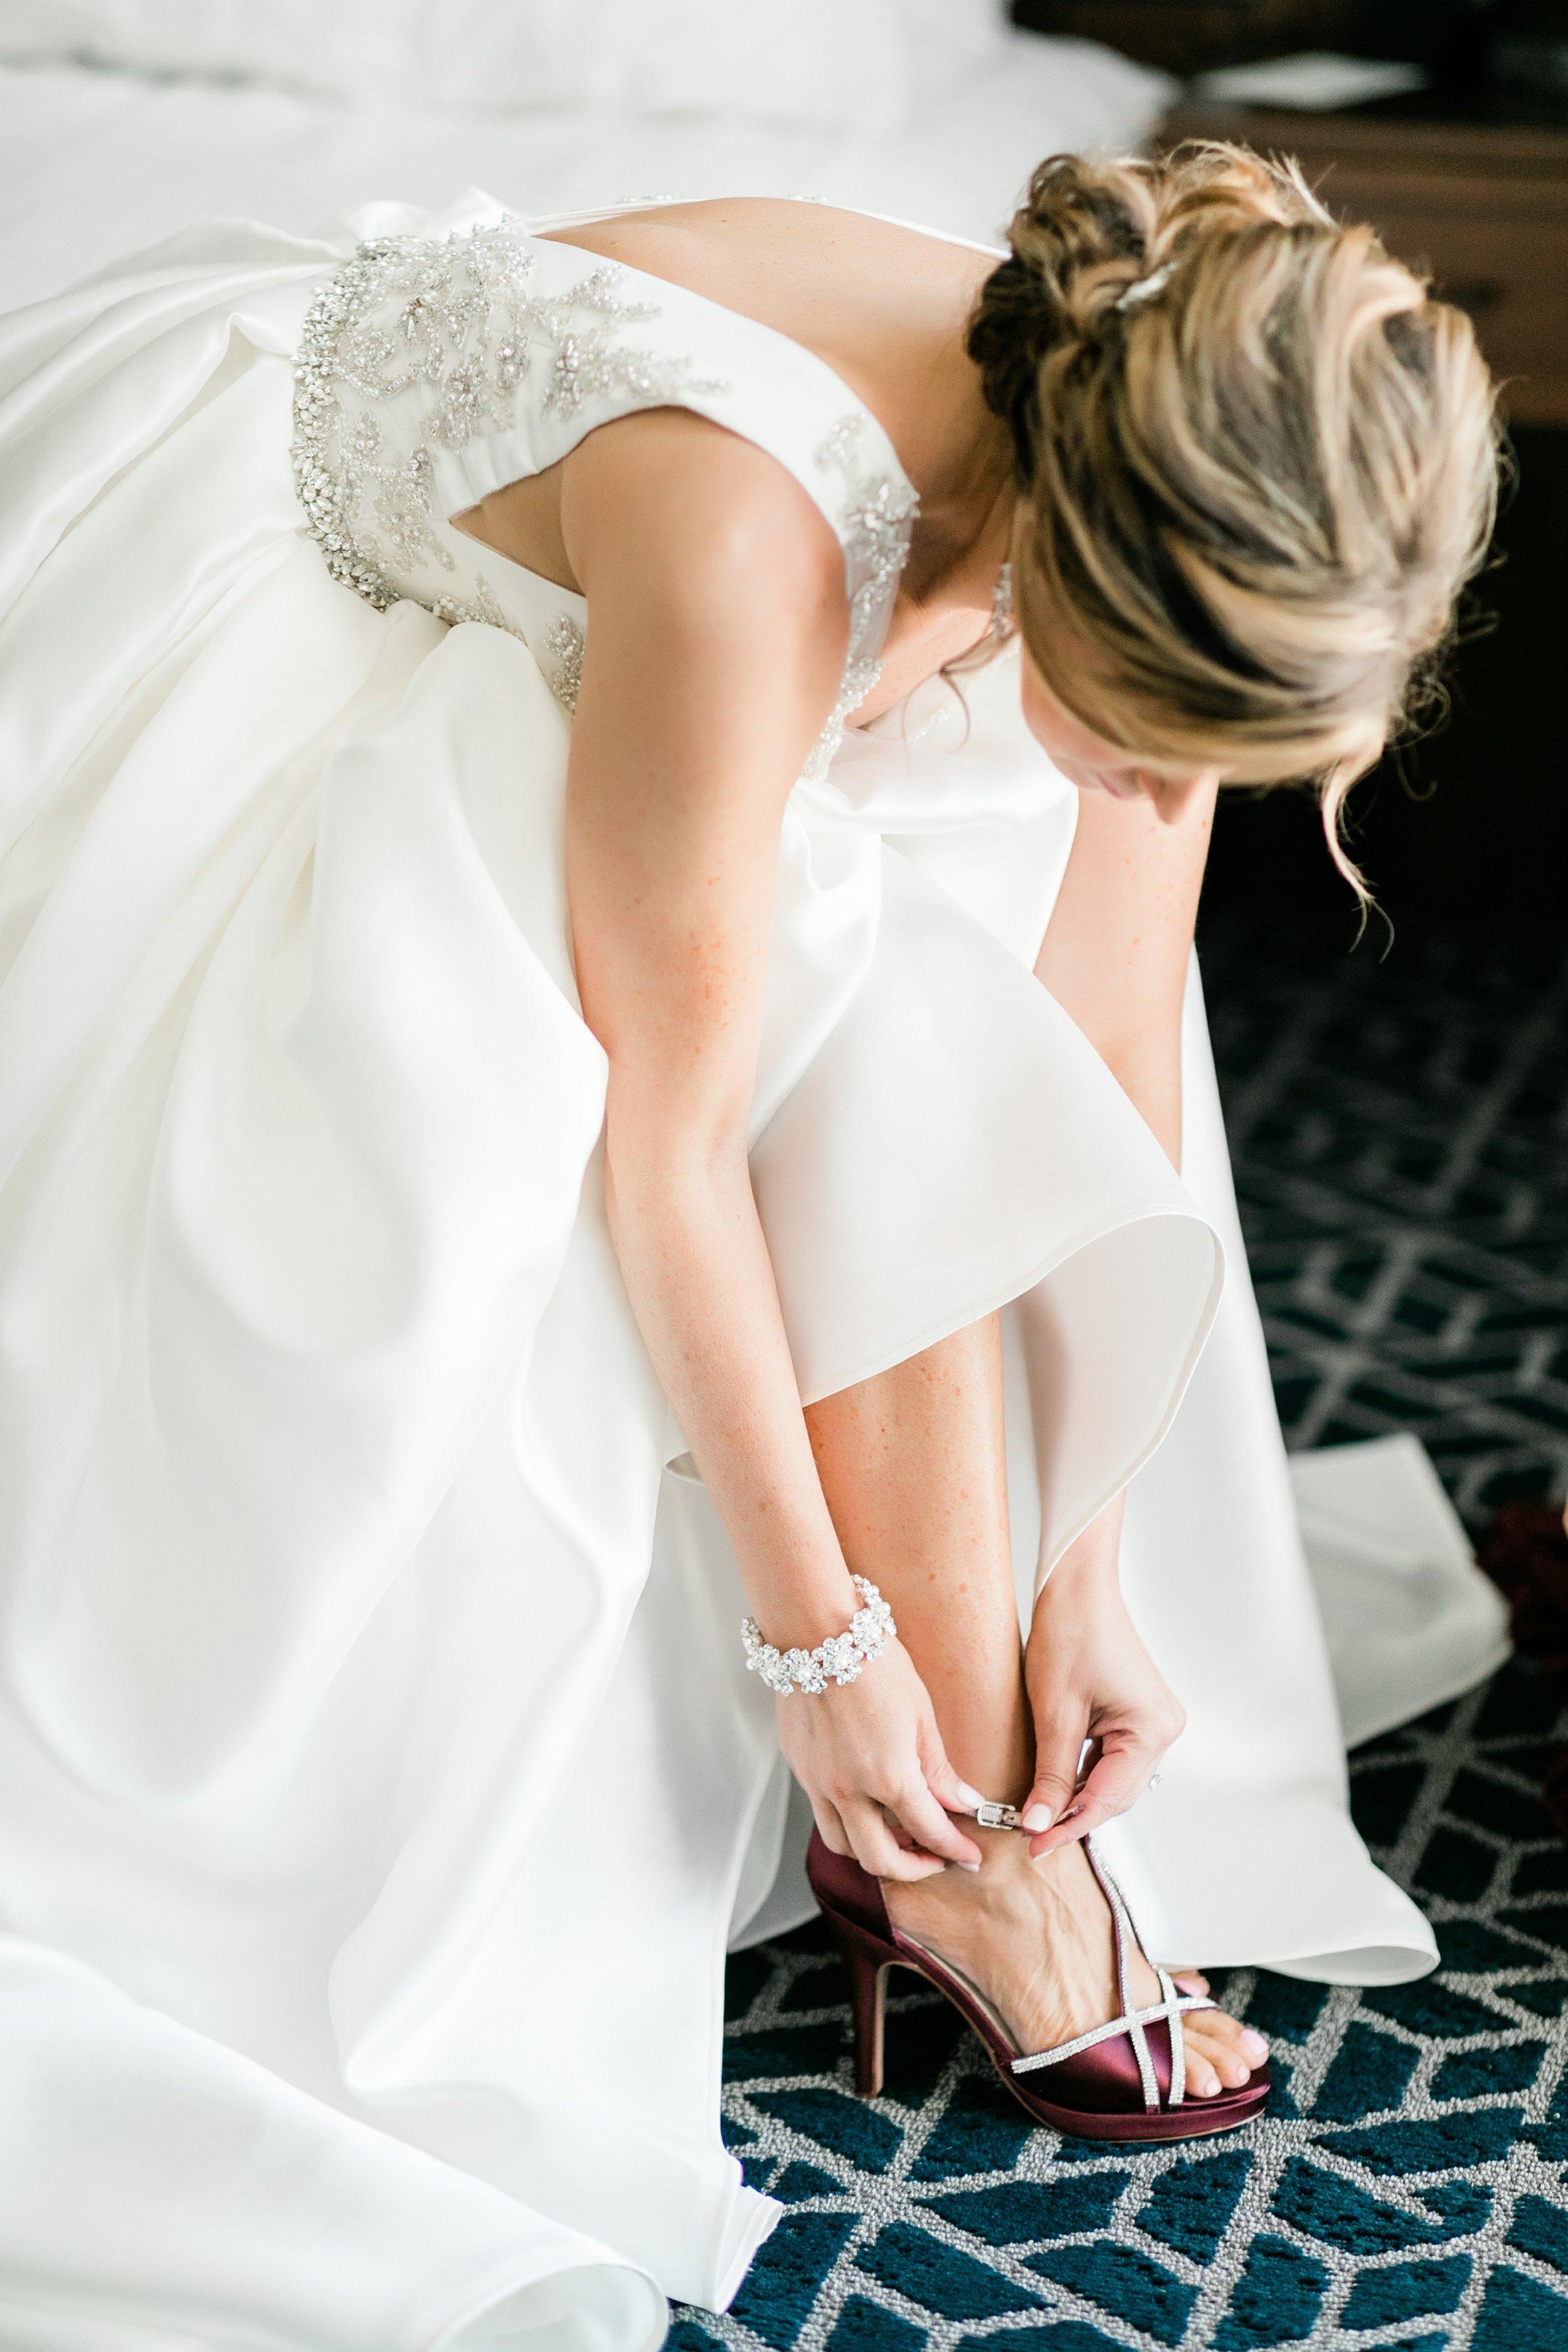 haehn-wedding-little-chapel-in-the-woods-denton-tx-lantana-golf-club-wedding-015.jpg